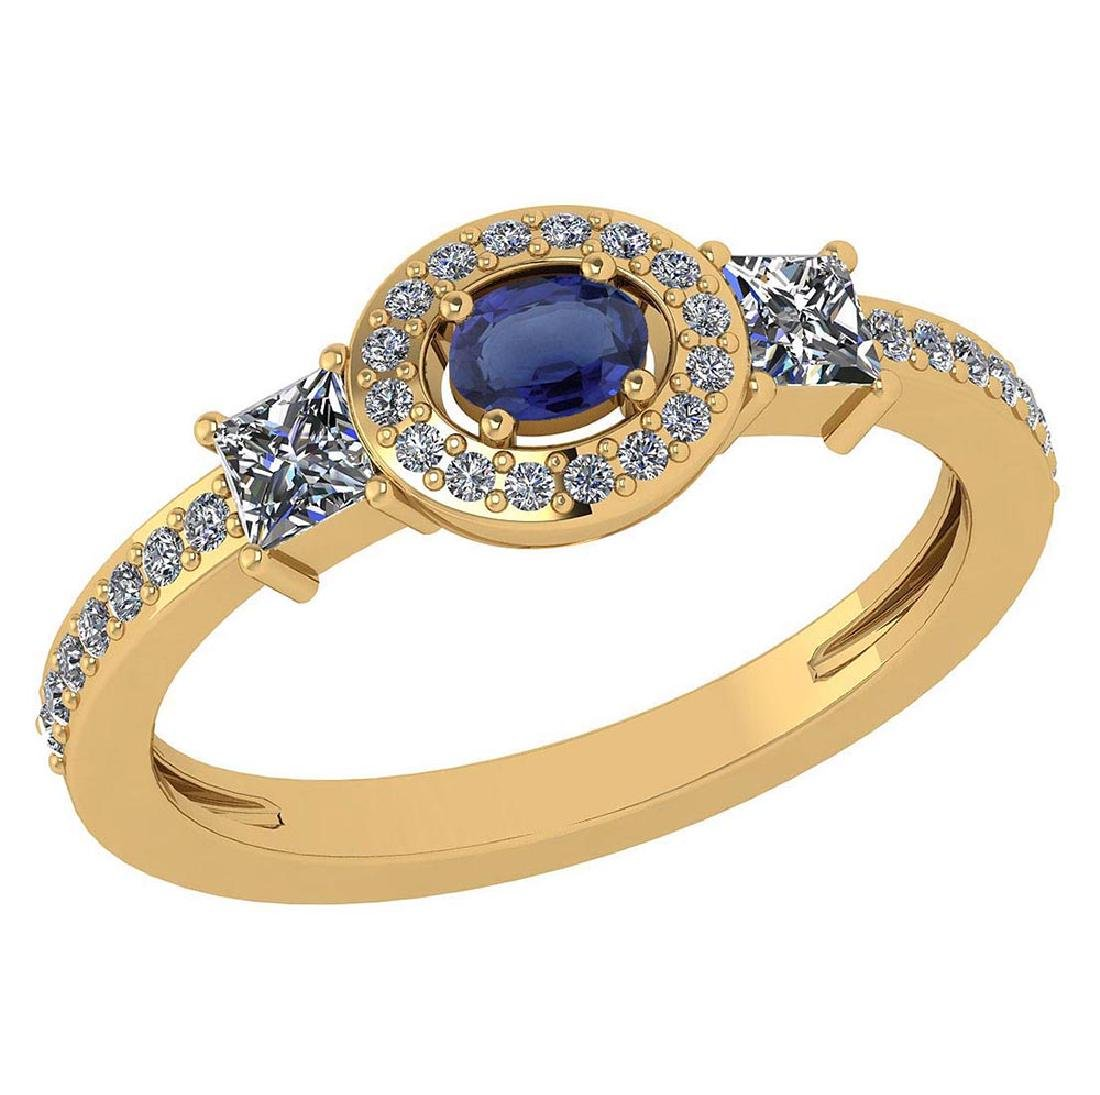 Certified 0.77 Ctw Blue Sapphire And Diamond 14k Yellow